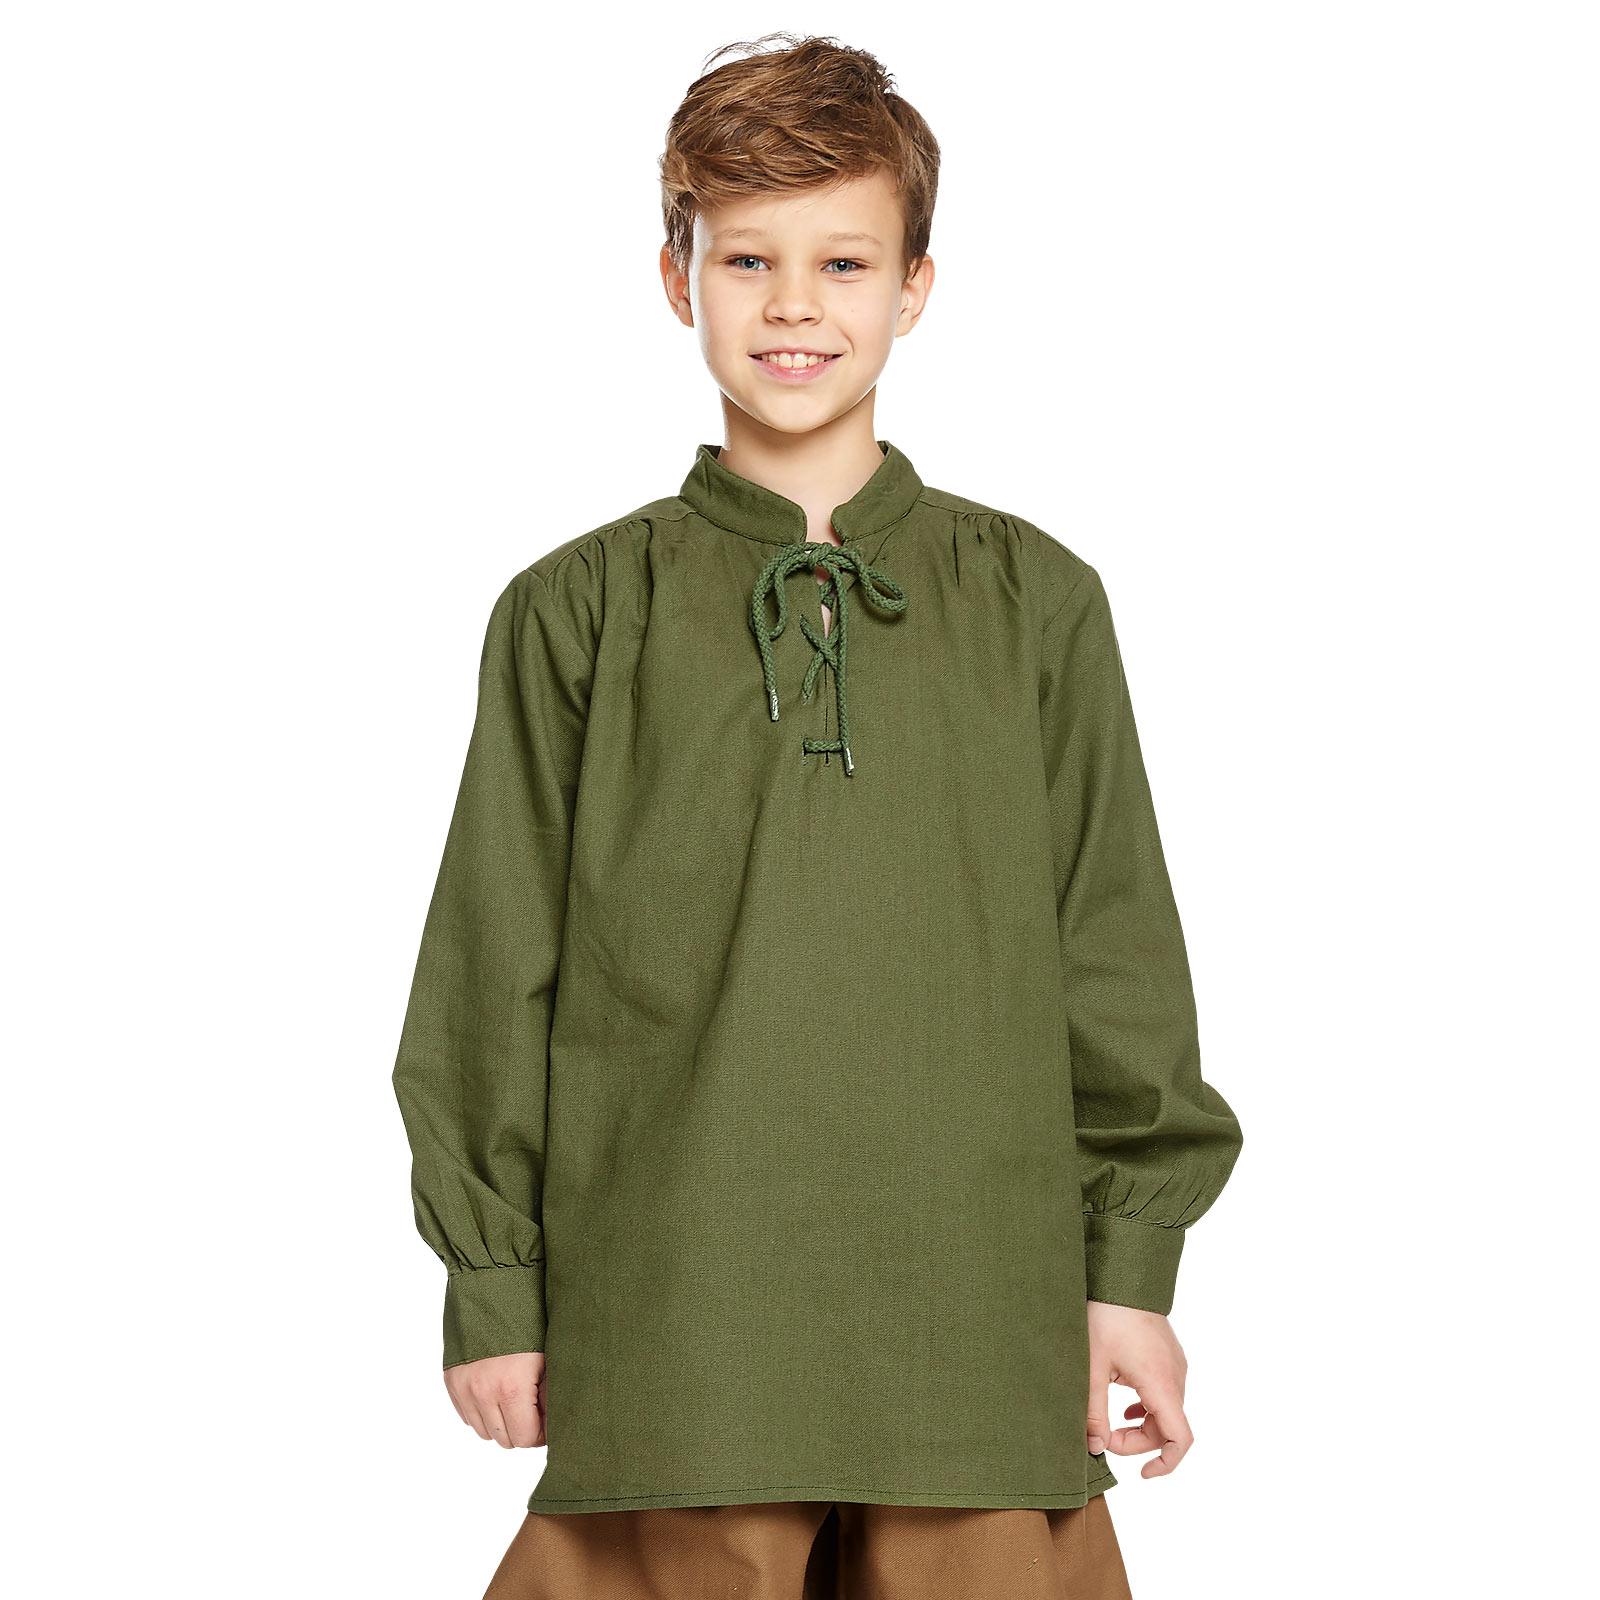 Mittelalter Hemd Kinder mit edler Rückenschnürung grün